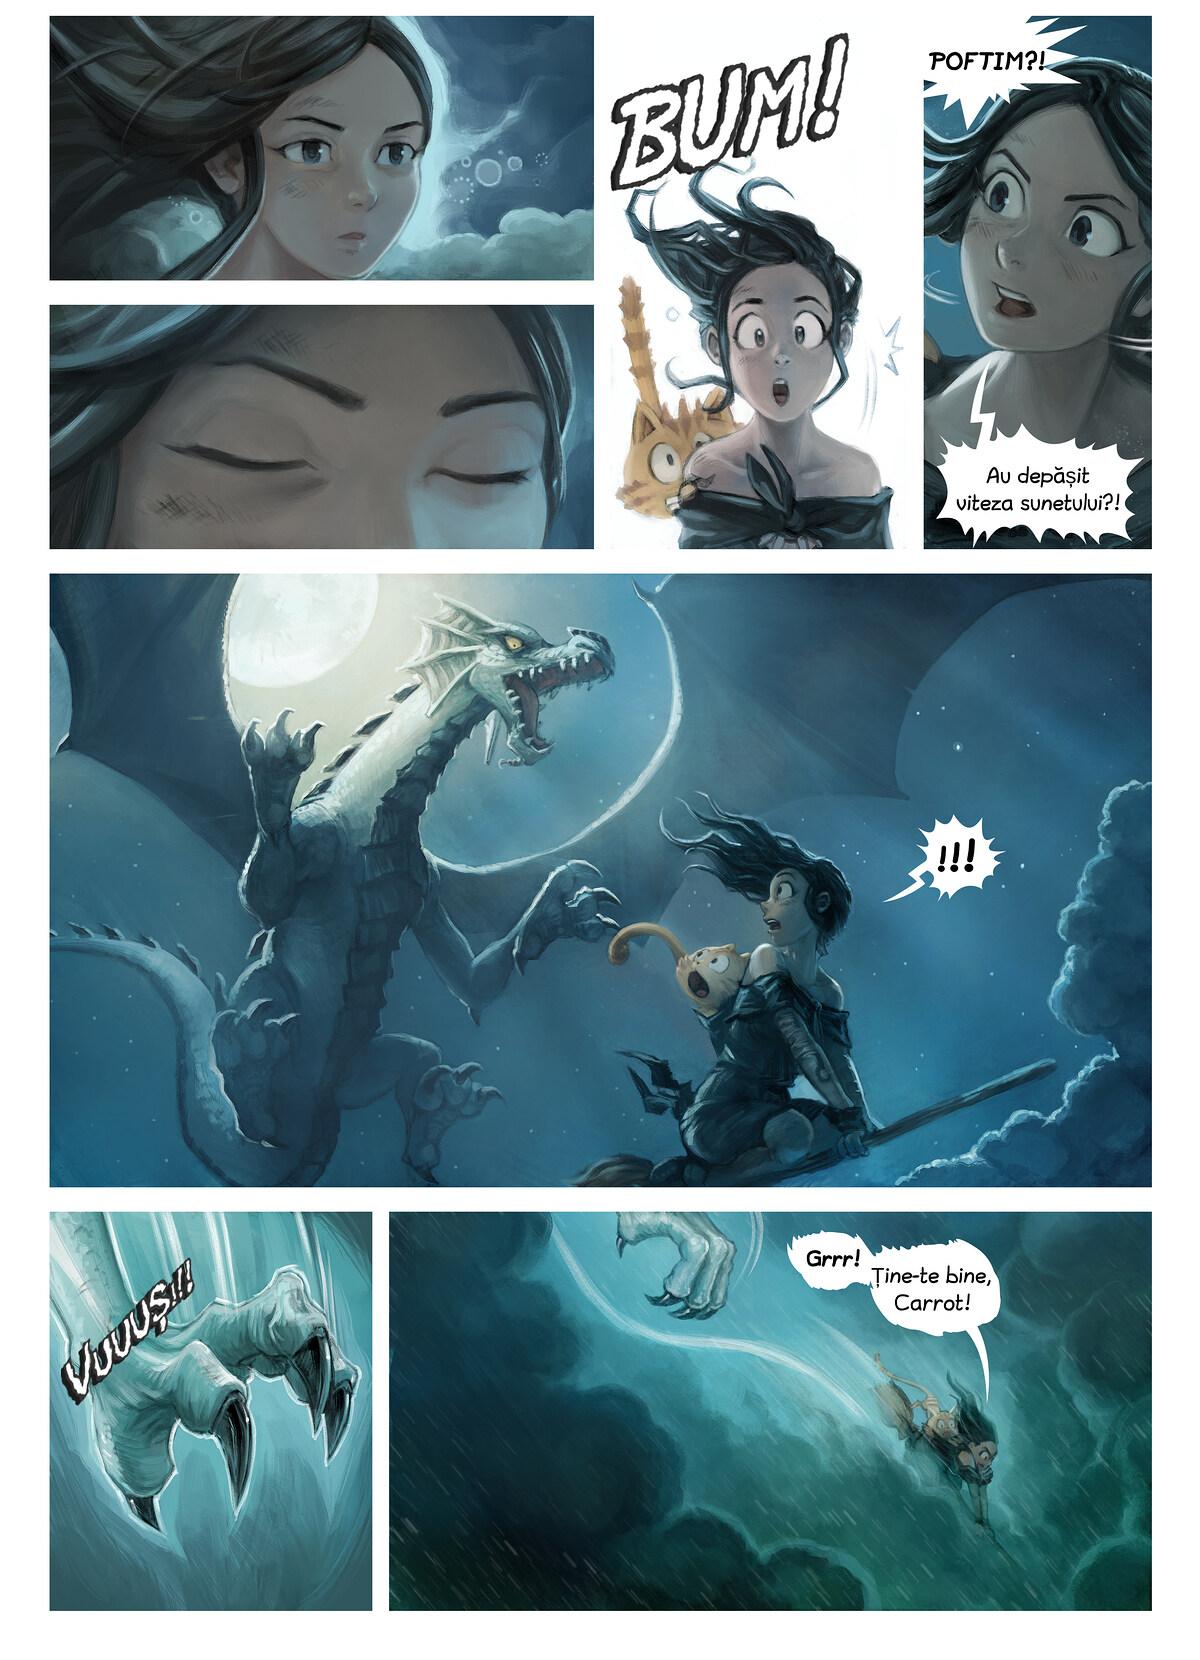 Episodul 35: Reflecția, Page 4